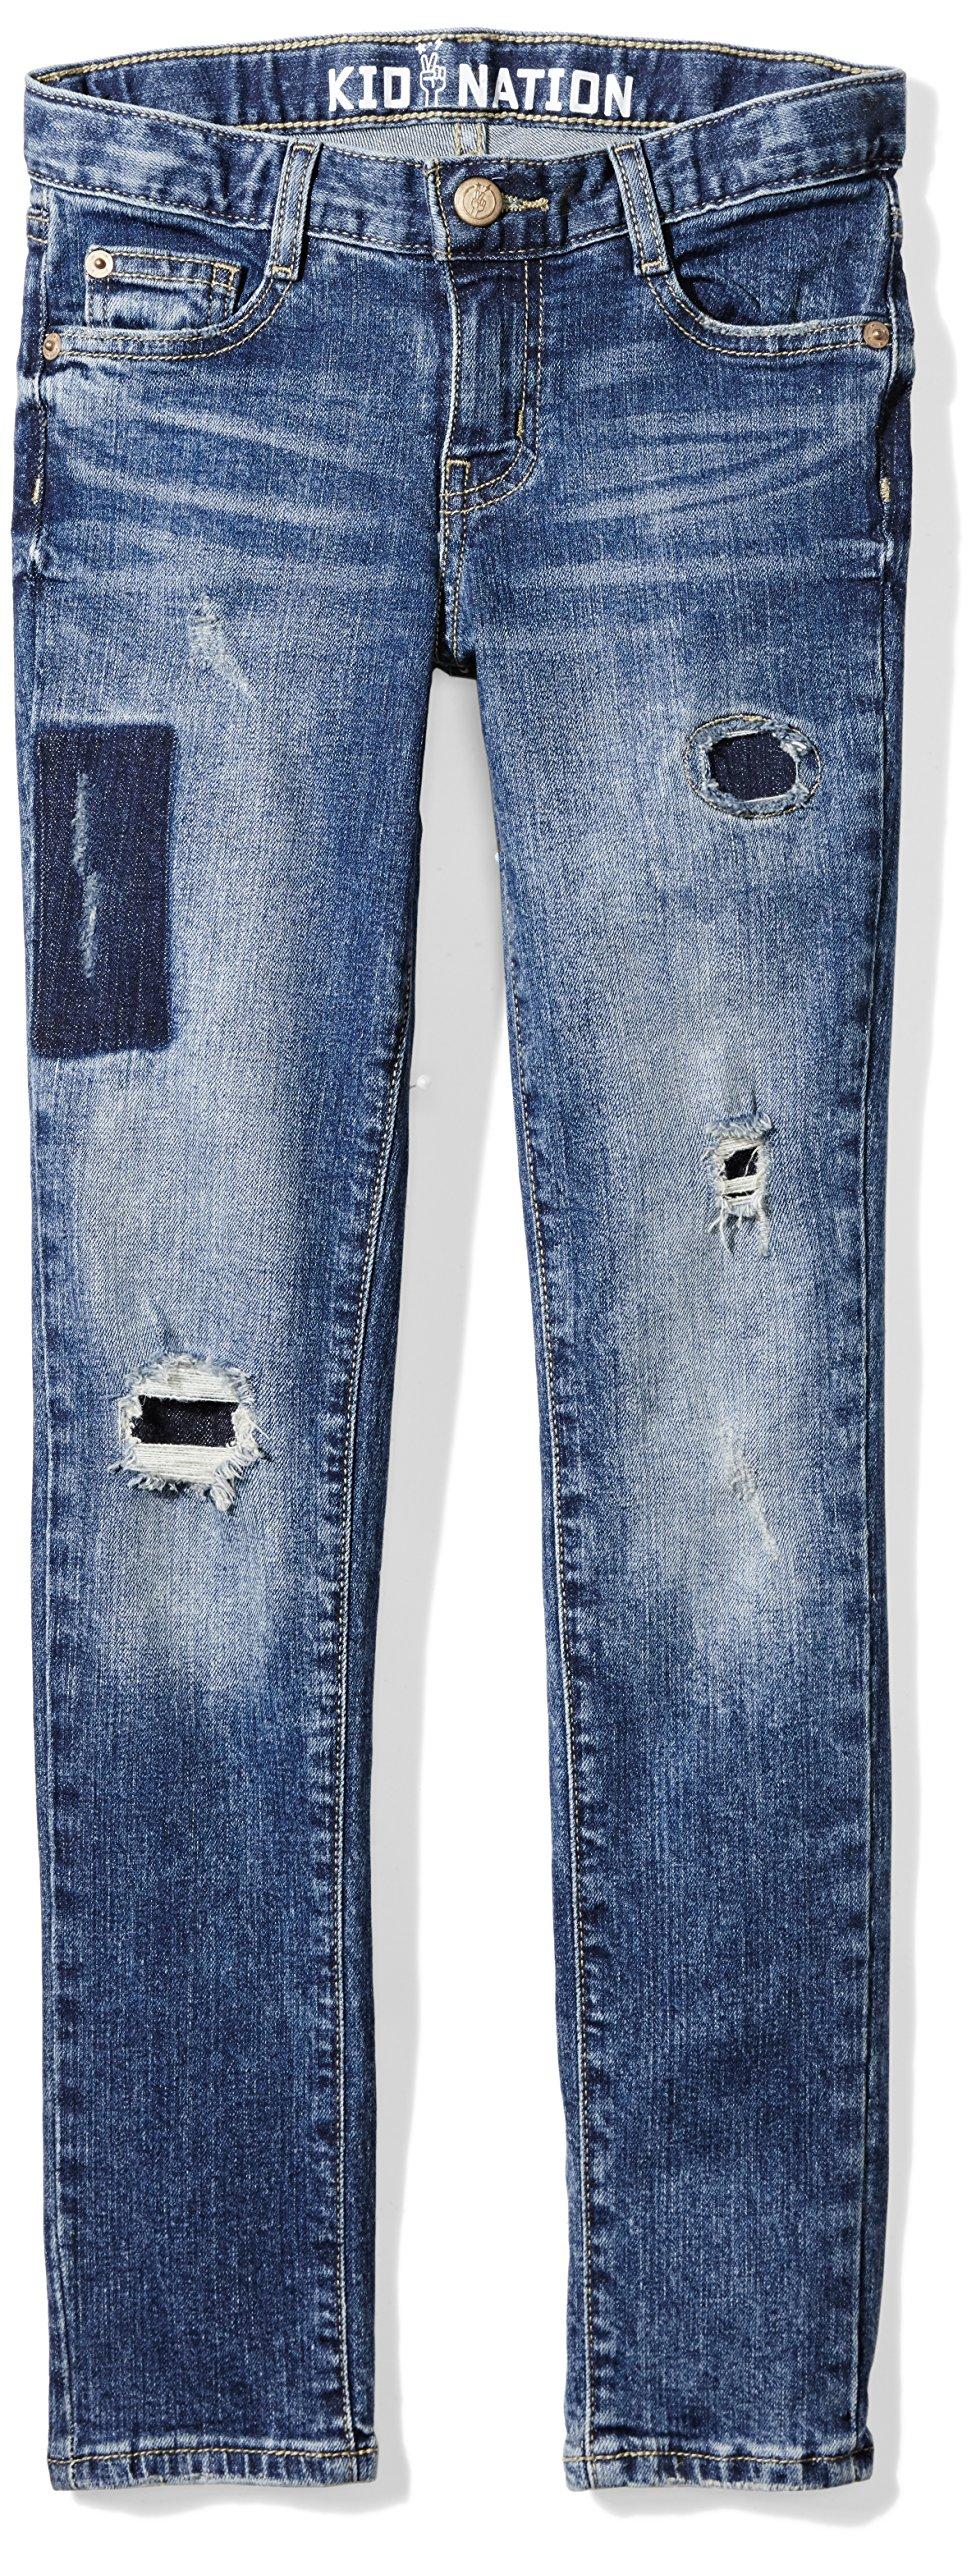 Kid Nation Girls Ankle Crop Jean Size 8